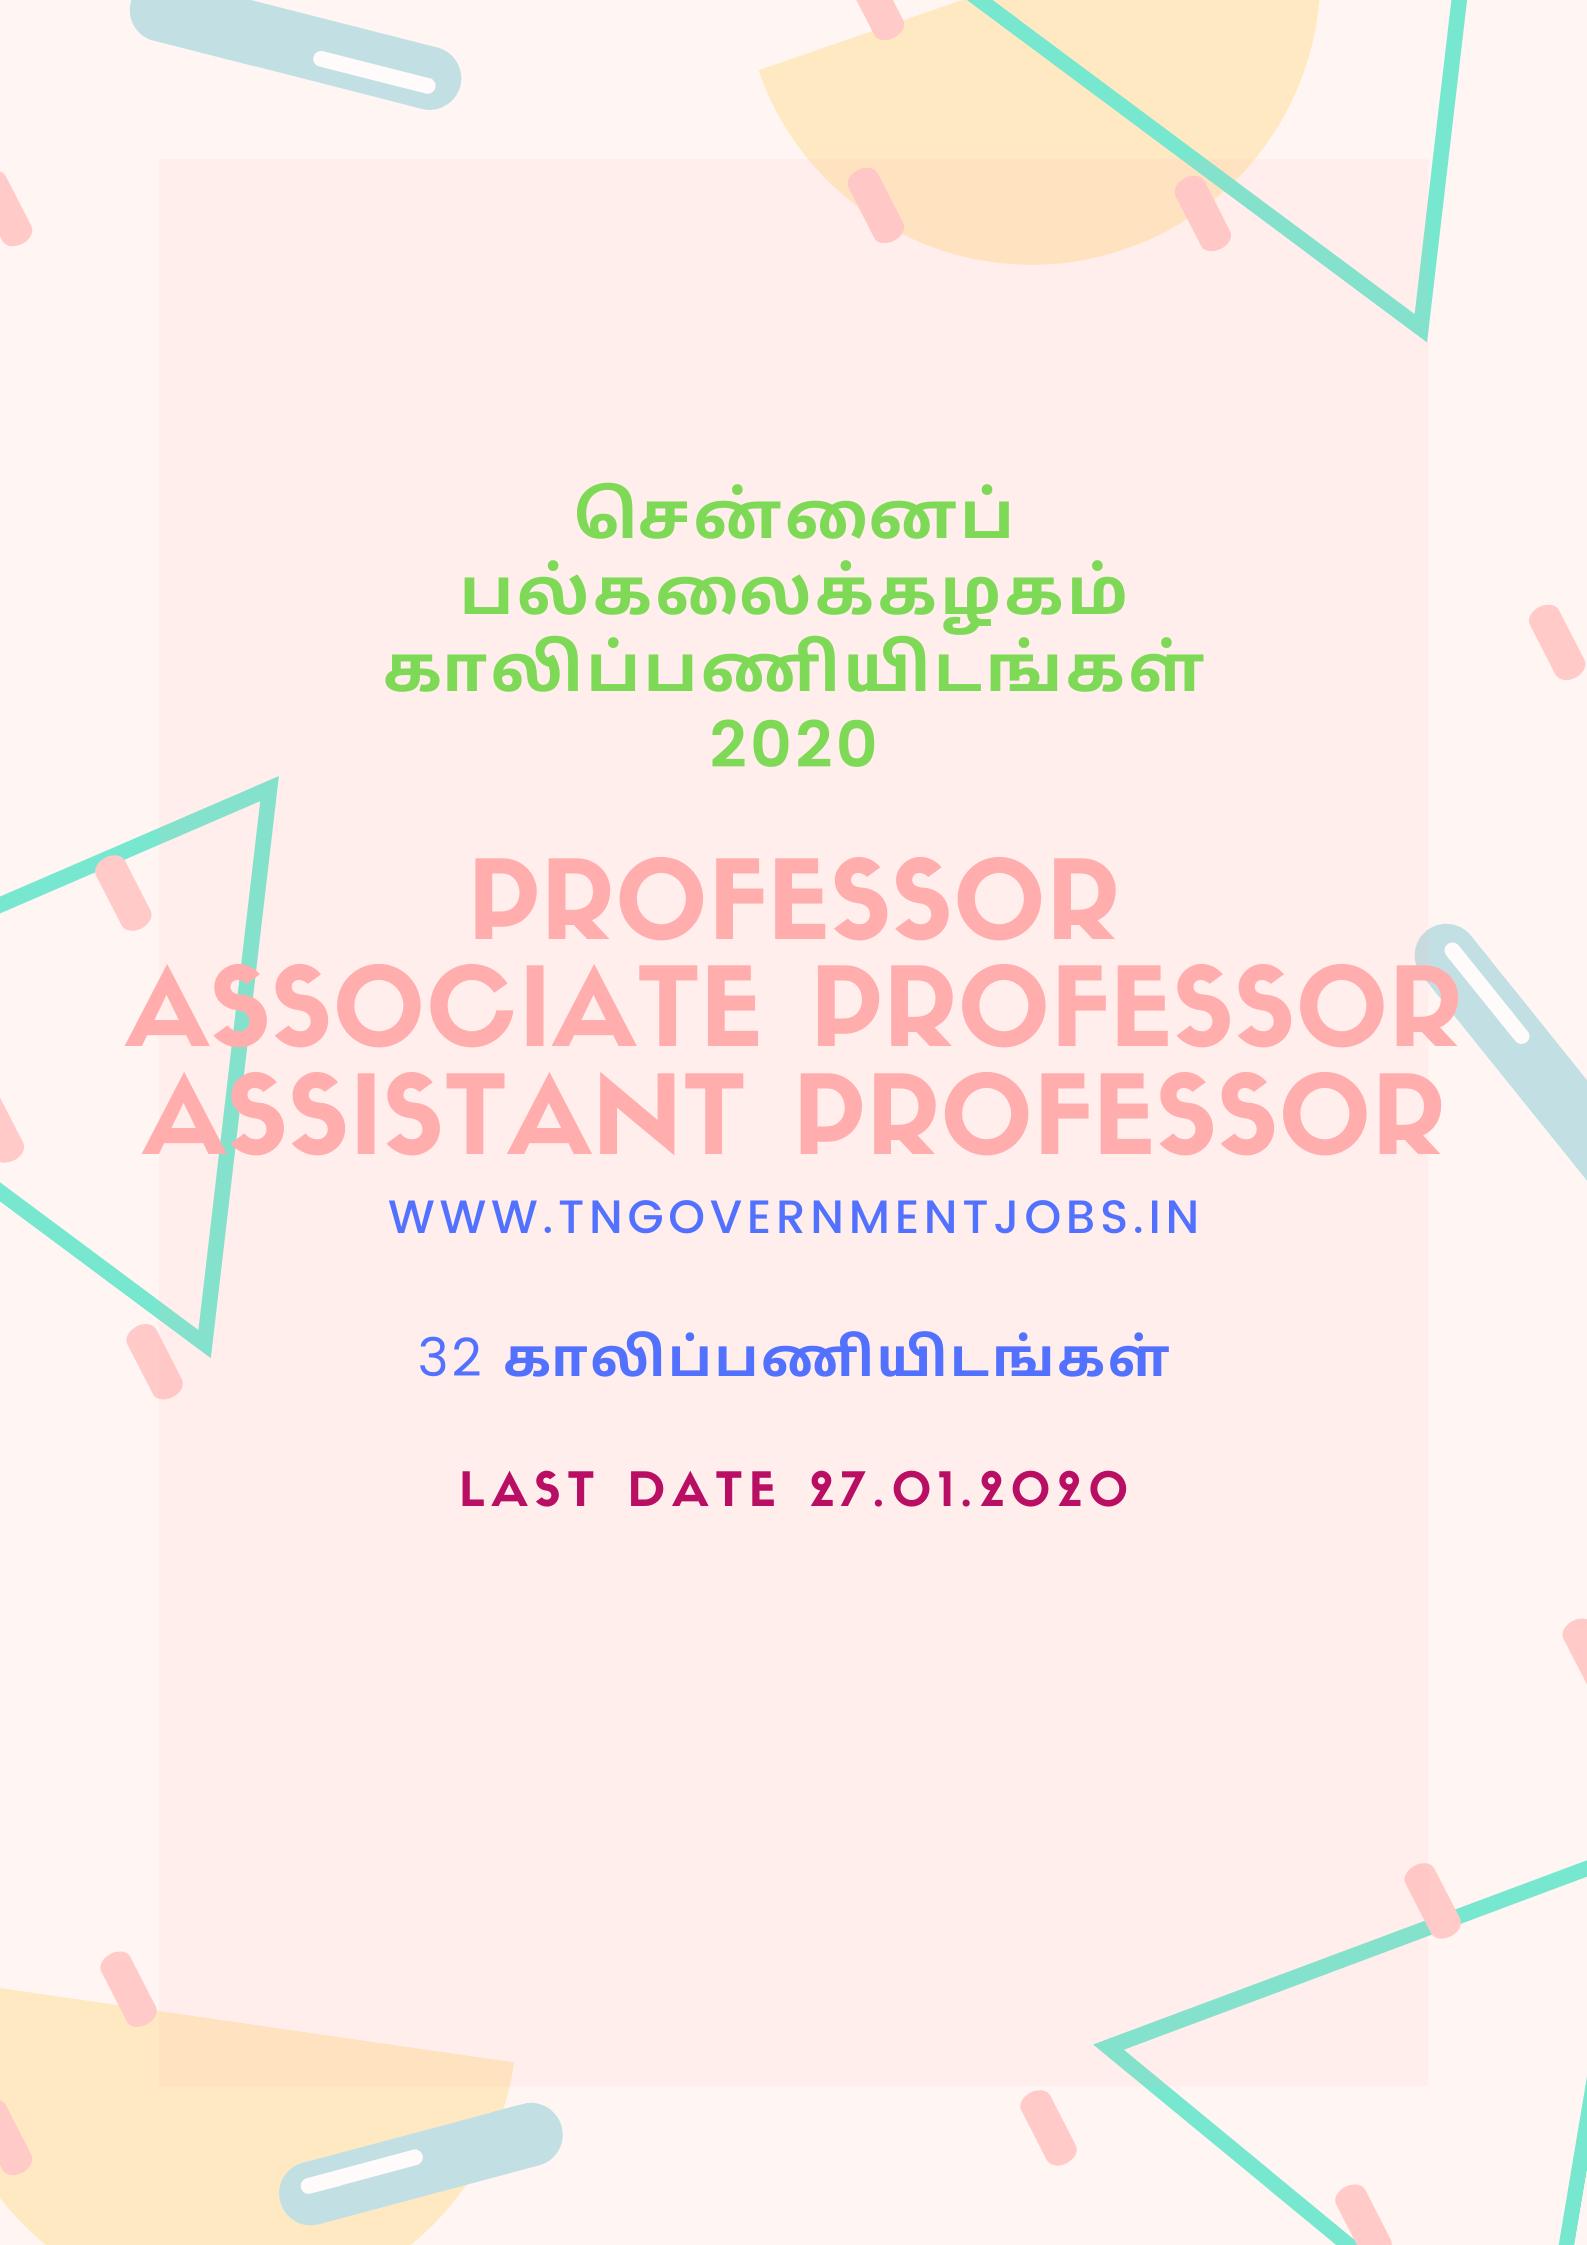 University of Madras Professor, Associate Professor